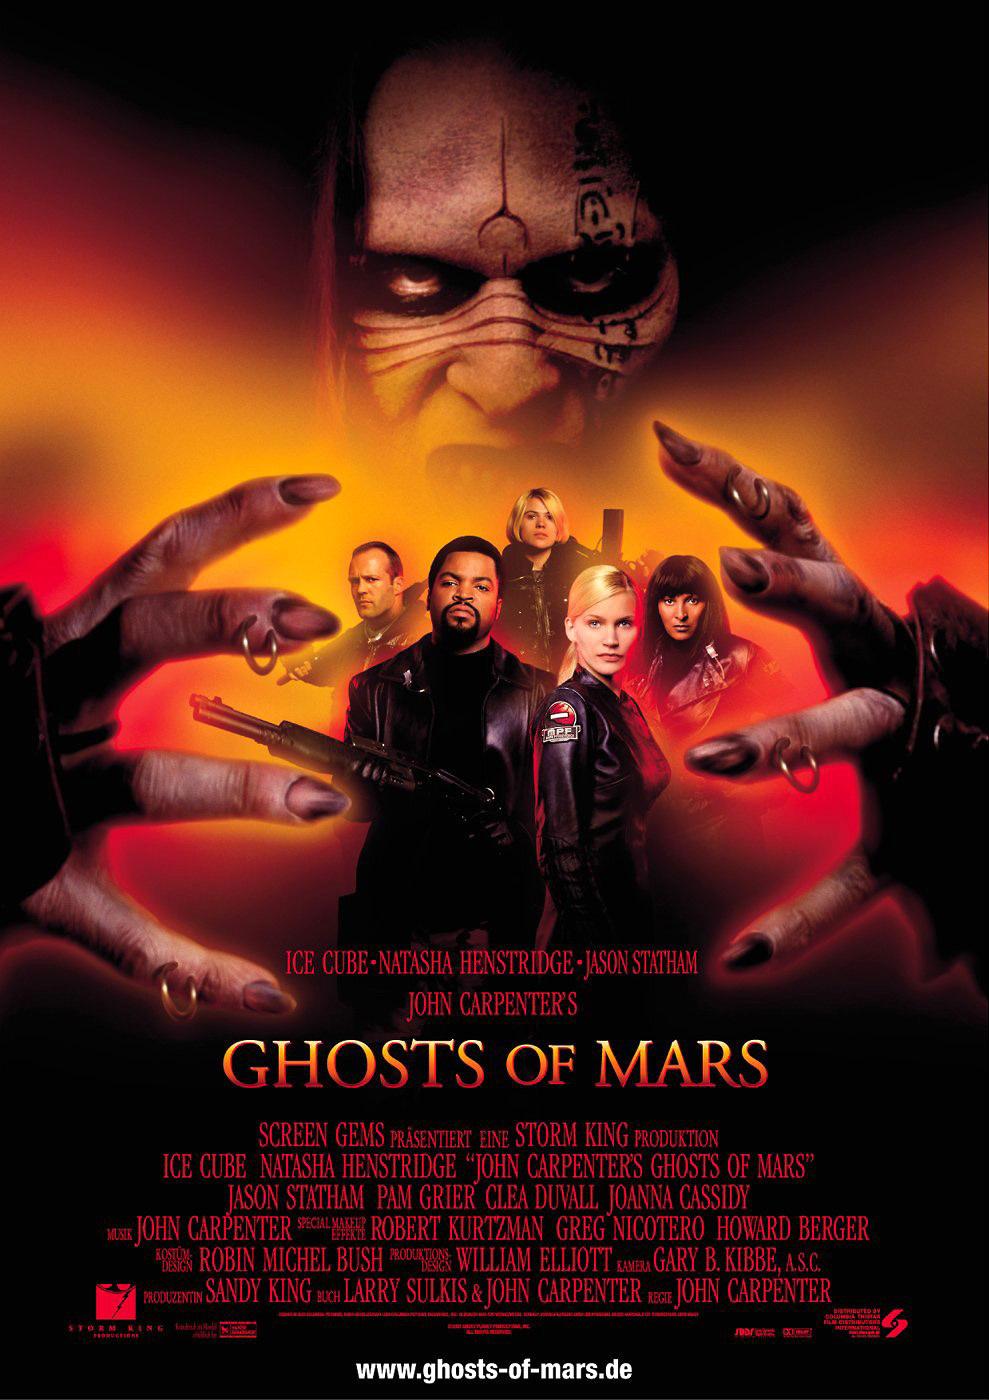 免费电影989_火星幽灵(ghosts of mars) - 电影图片 | 电影剧照